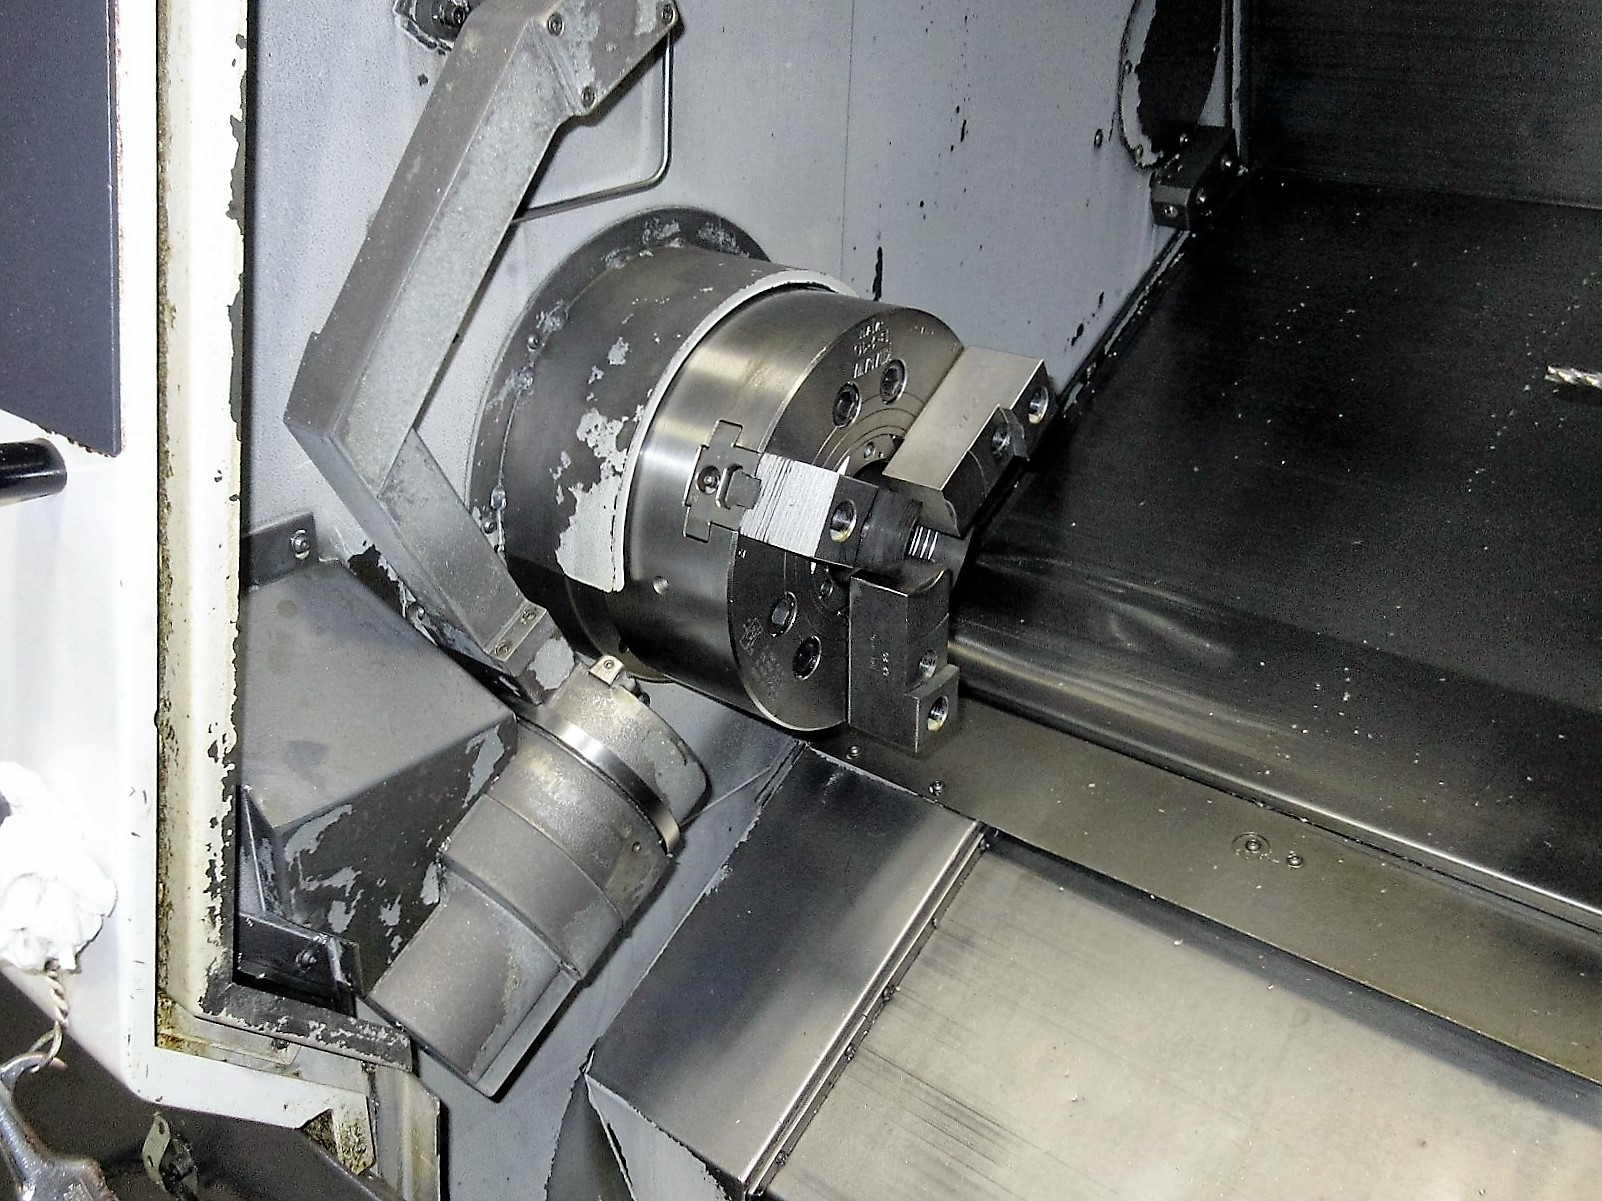 MAZAK QUICK TURN NEXUS 250-II MSY CNC TURNING CENTER - Image 5 of 16